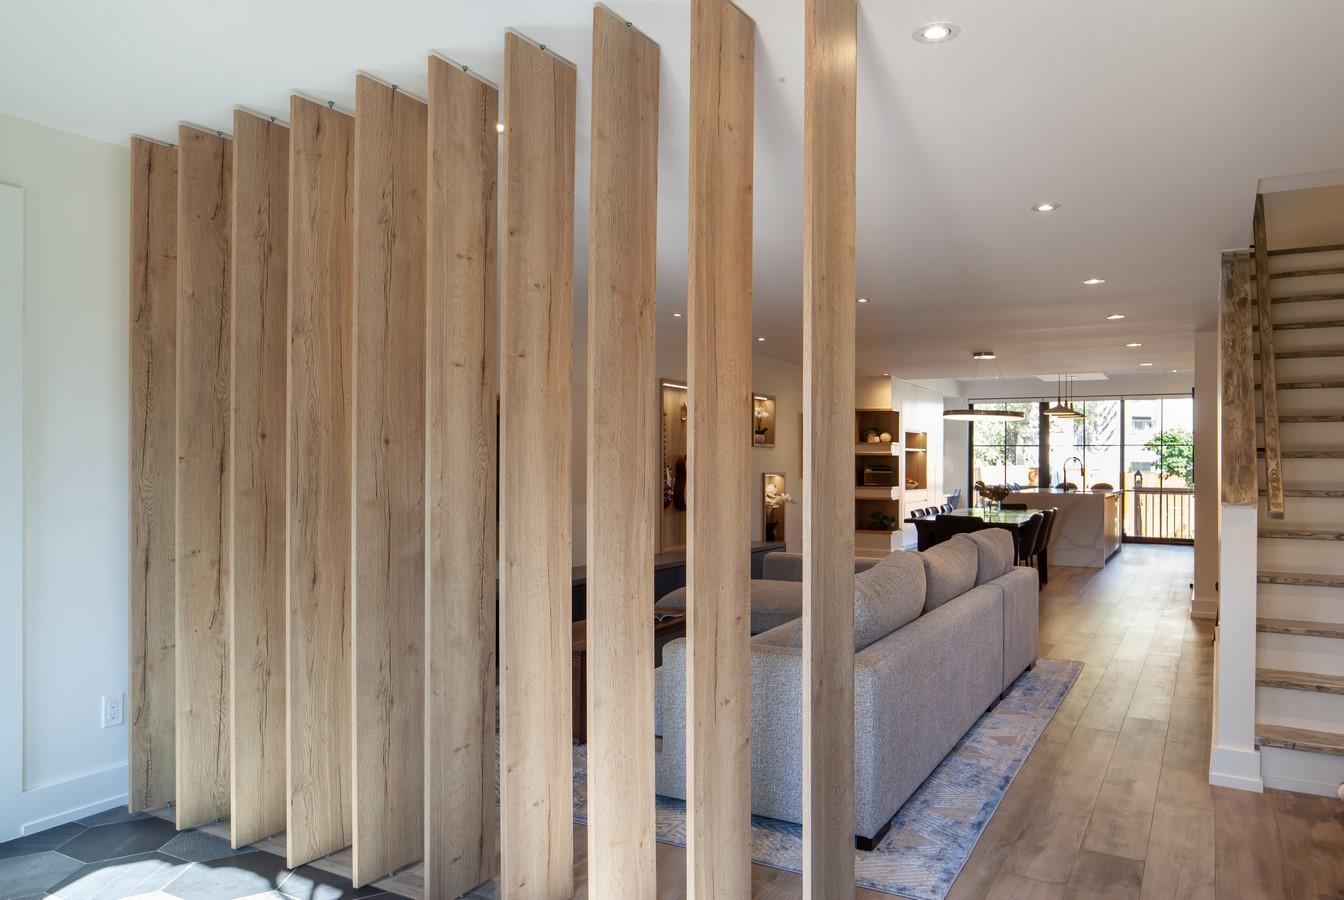 5113 Wychwood House by Joanne Myers Architect: Sheet 3